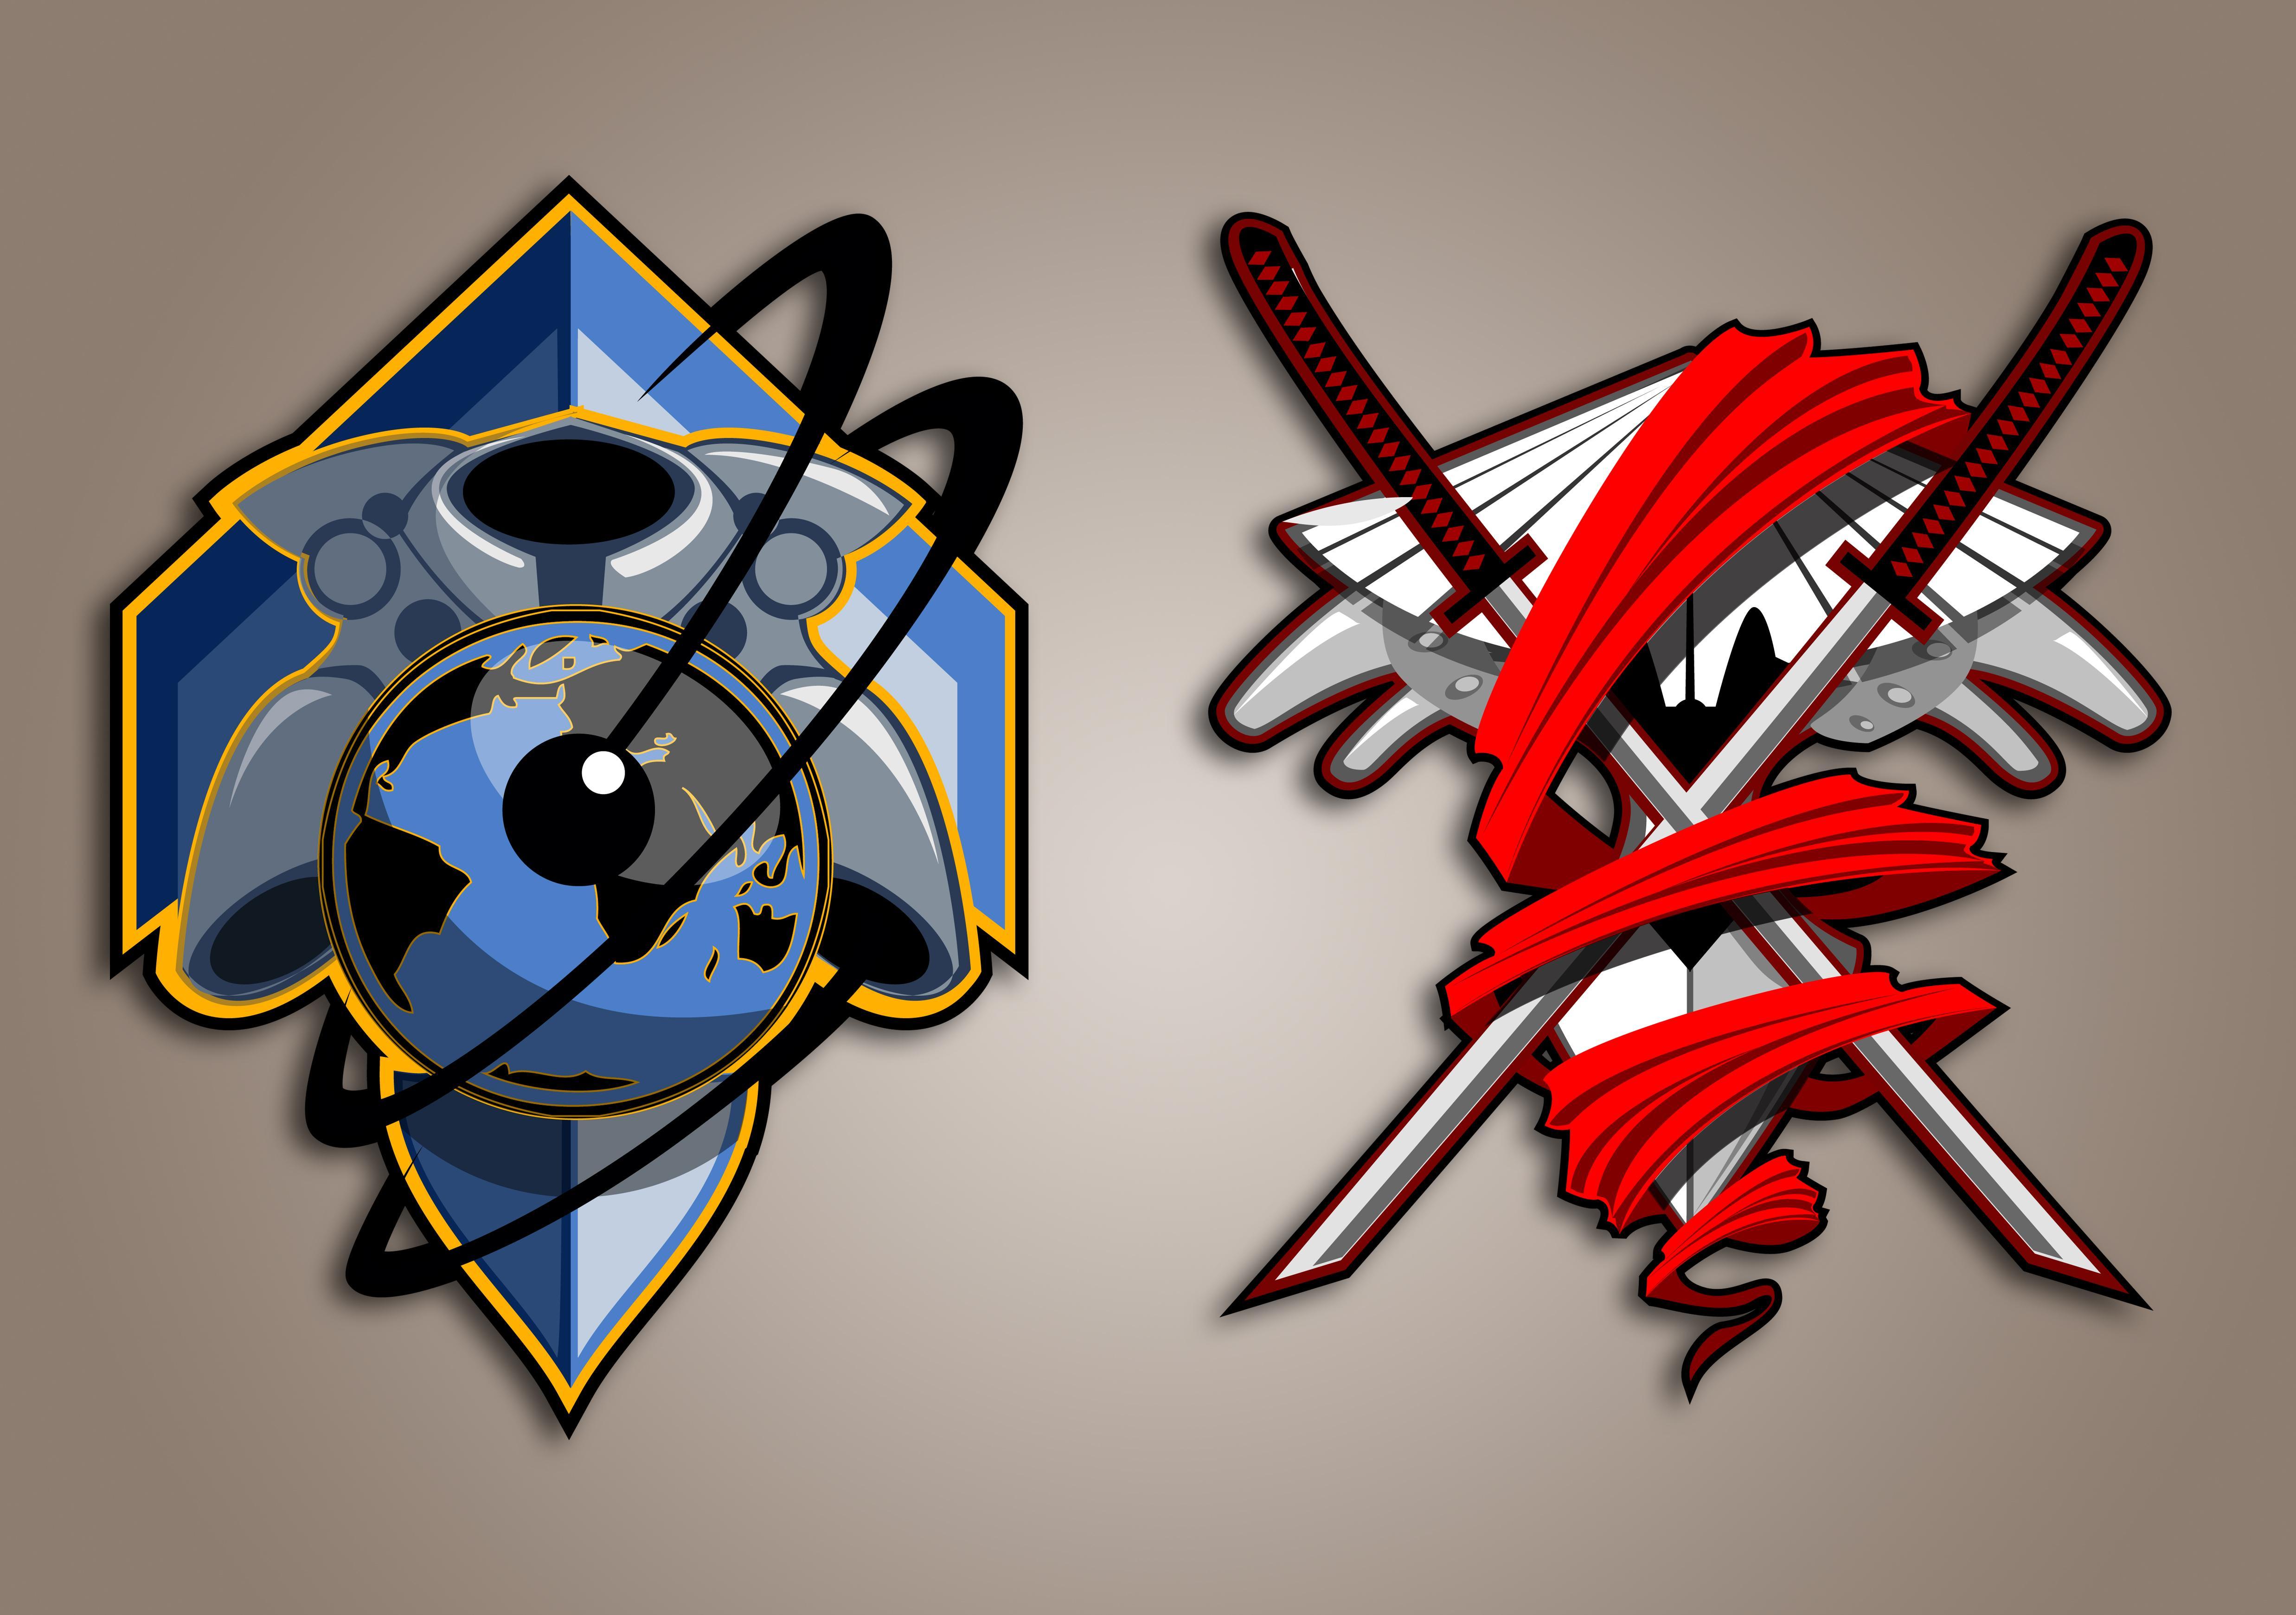 terran titans team bushido emblems